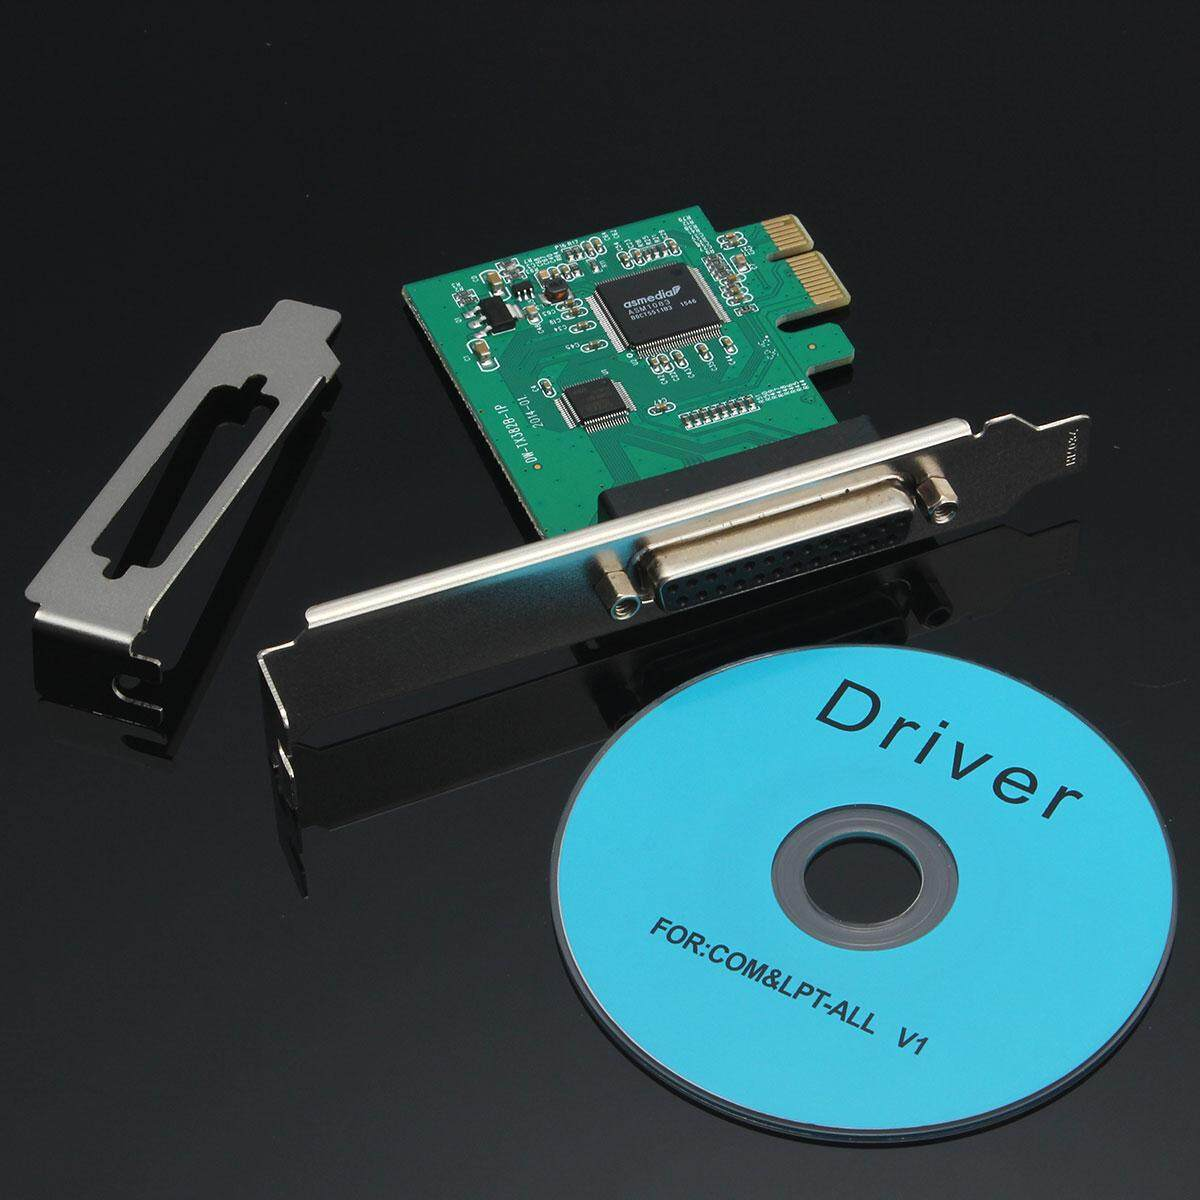 PCI-E Parallel Port Express Card Converter Adapter +Low Profile Bracket